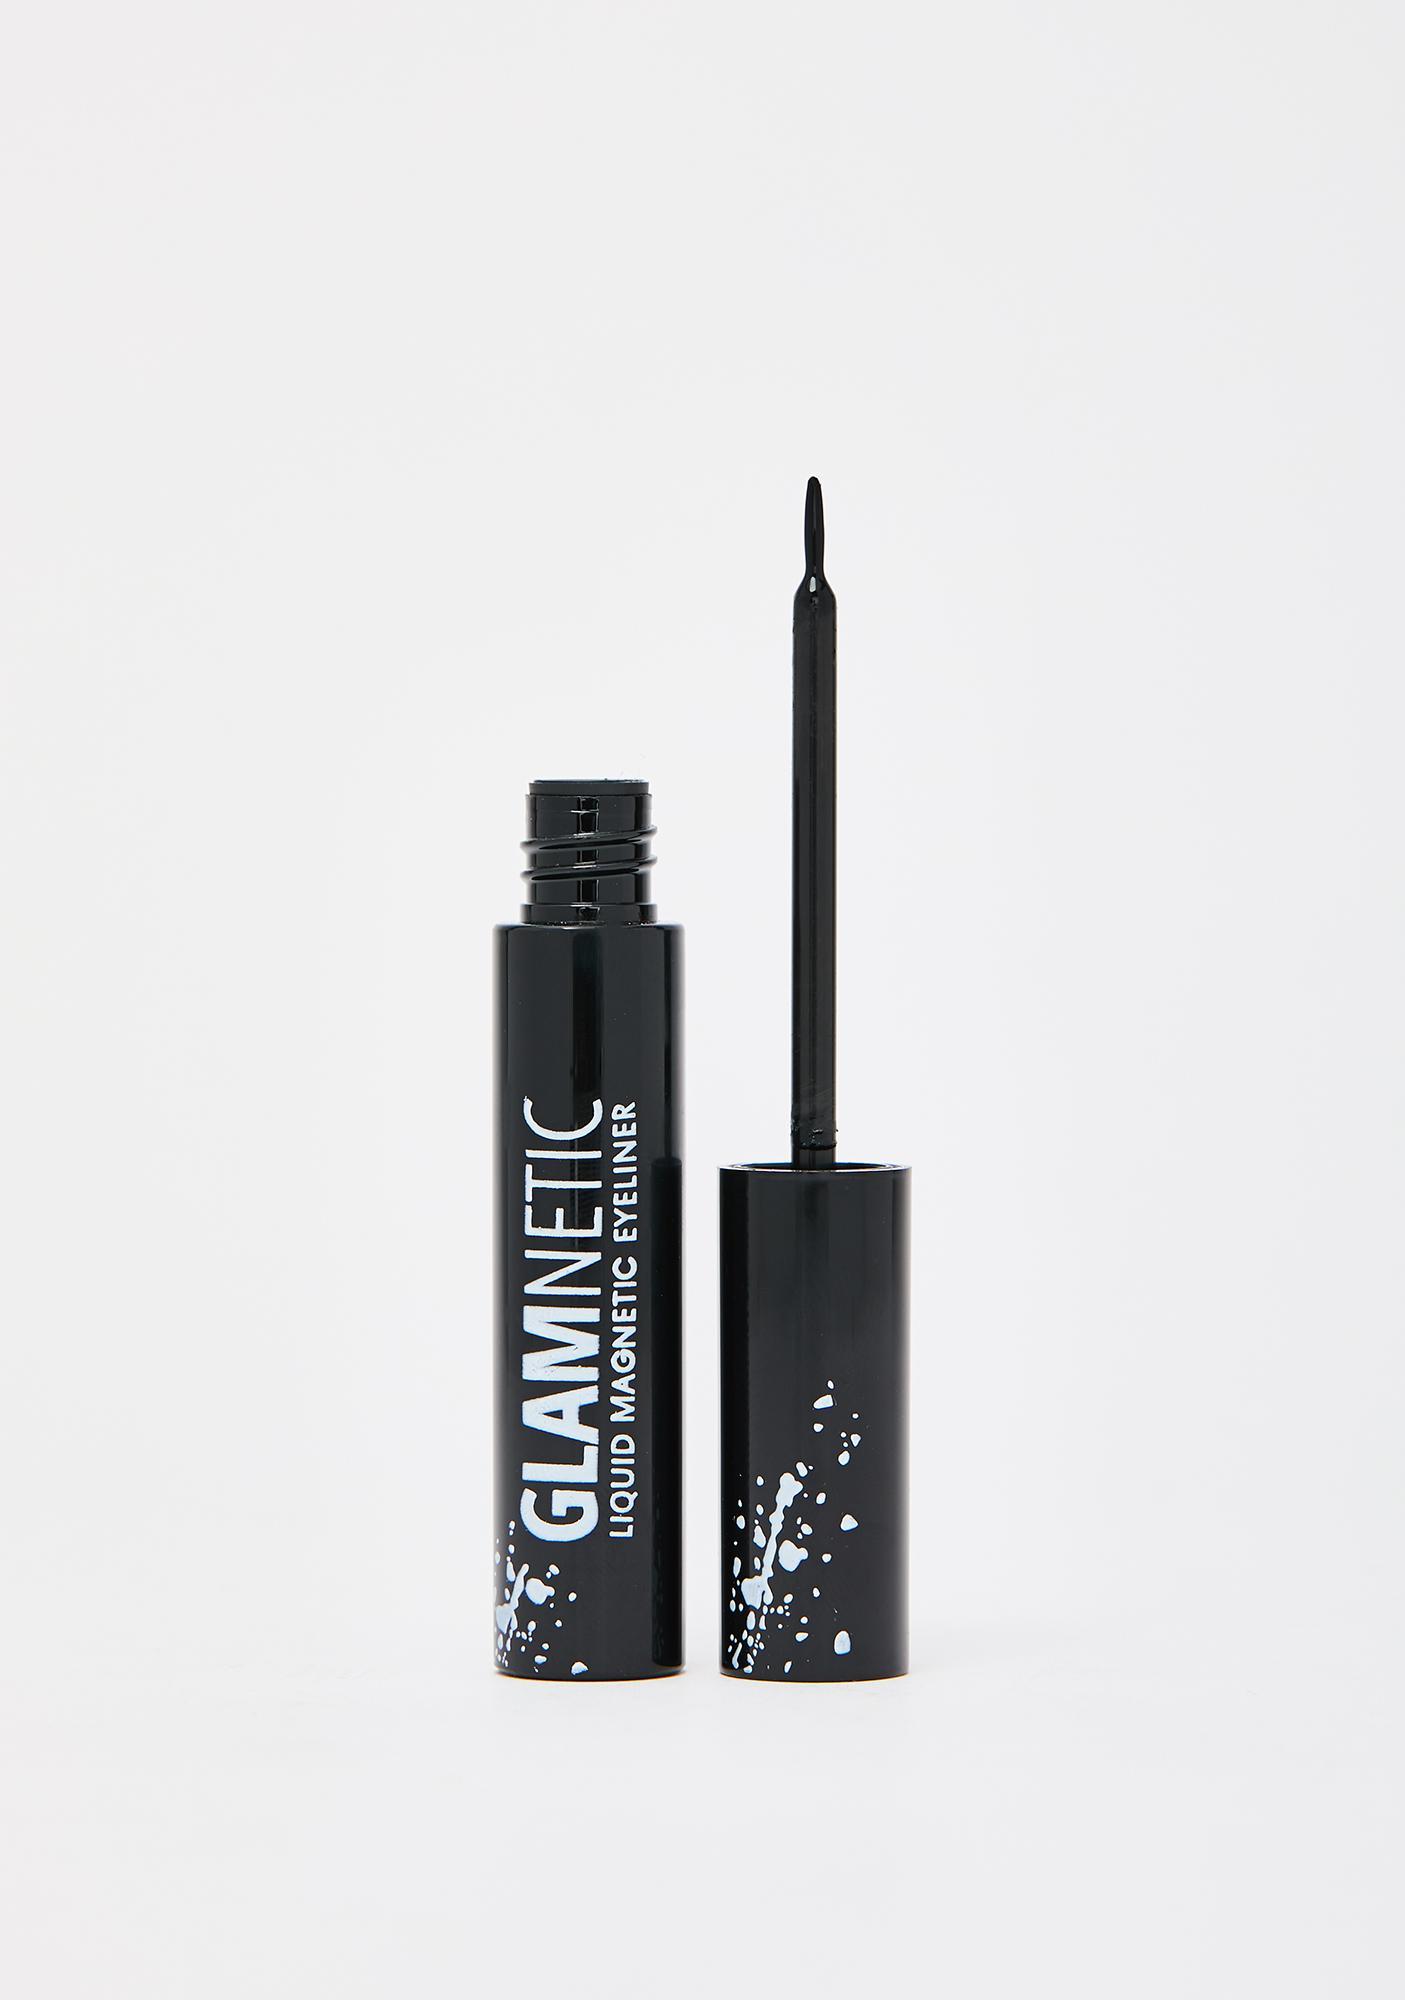 Glamnetic Magnetic Liquid Eyeliner